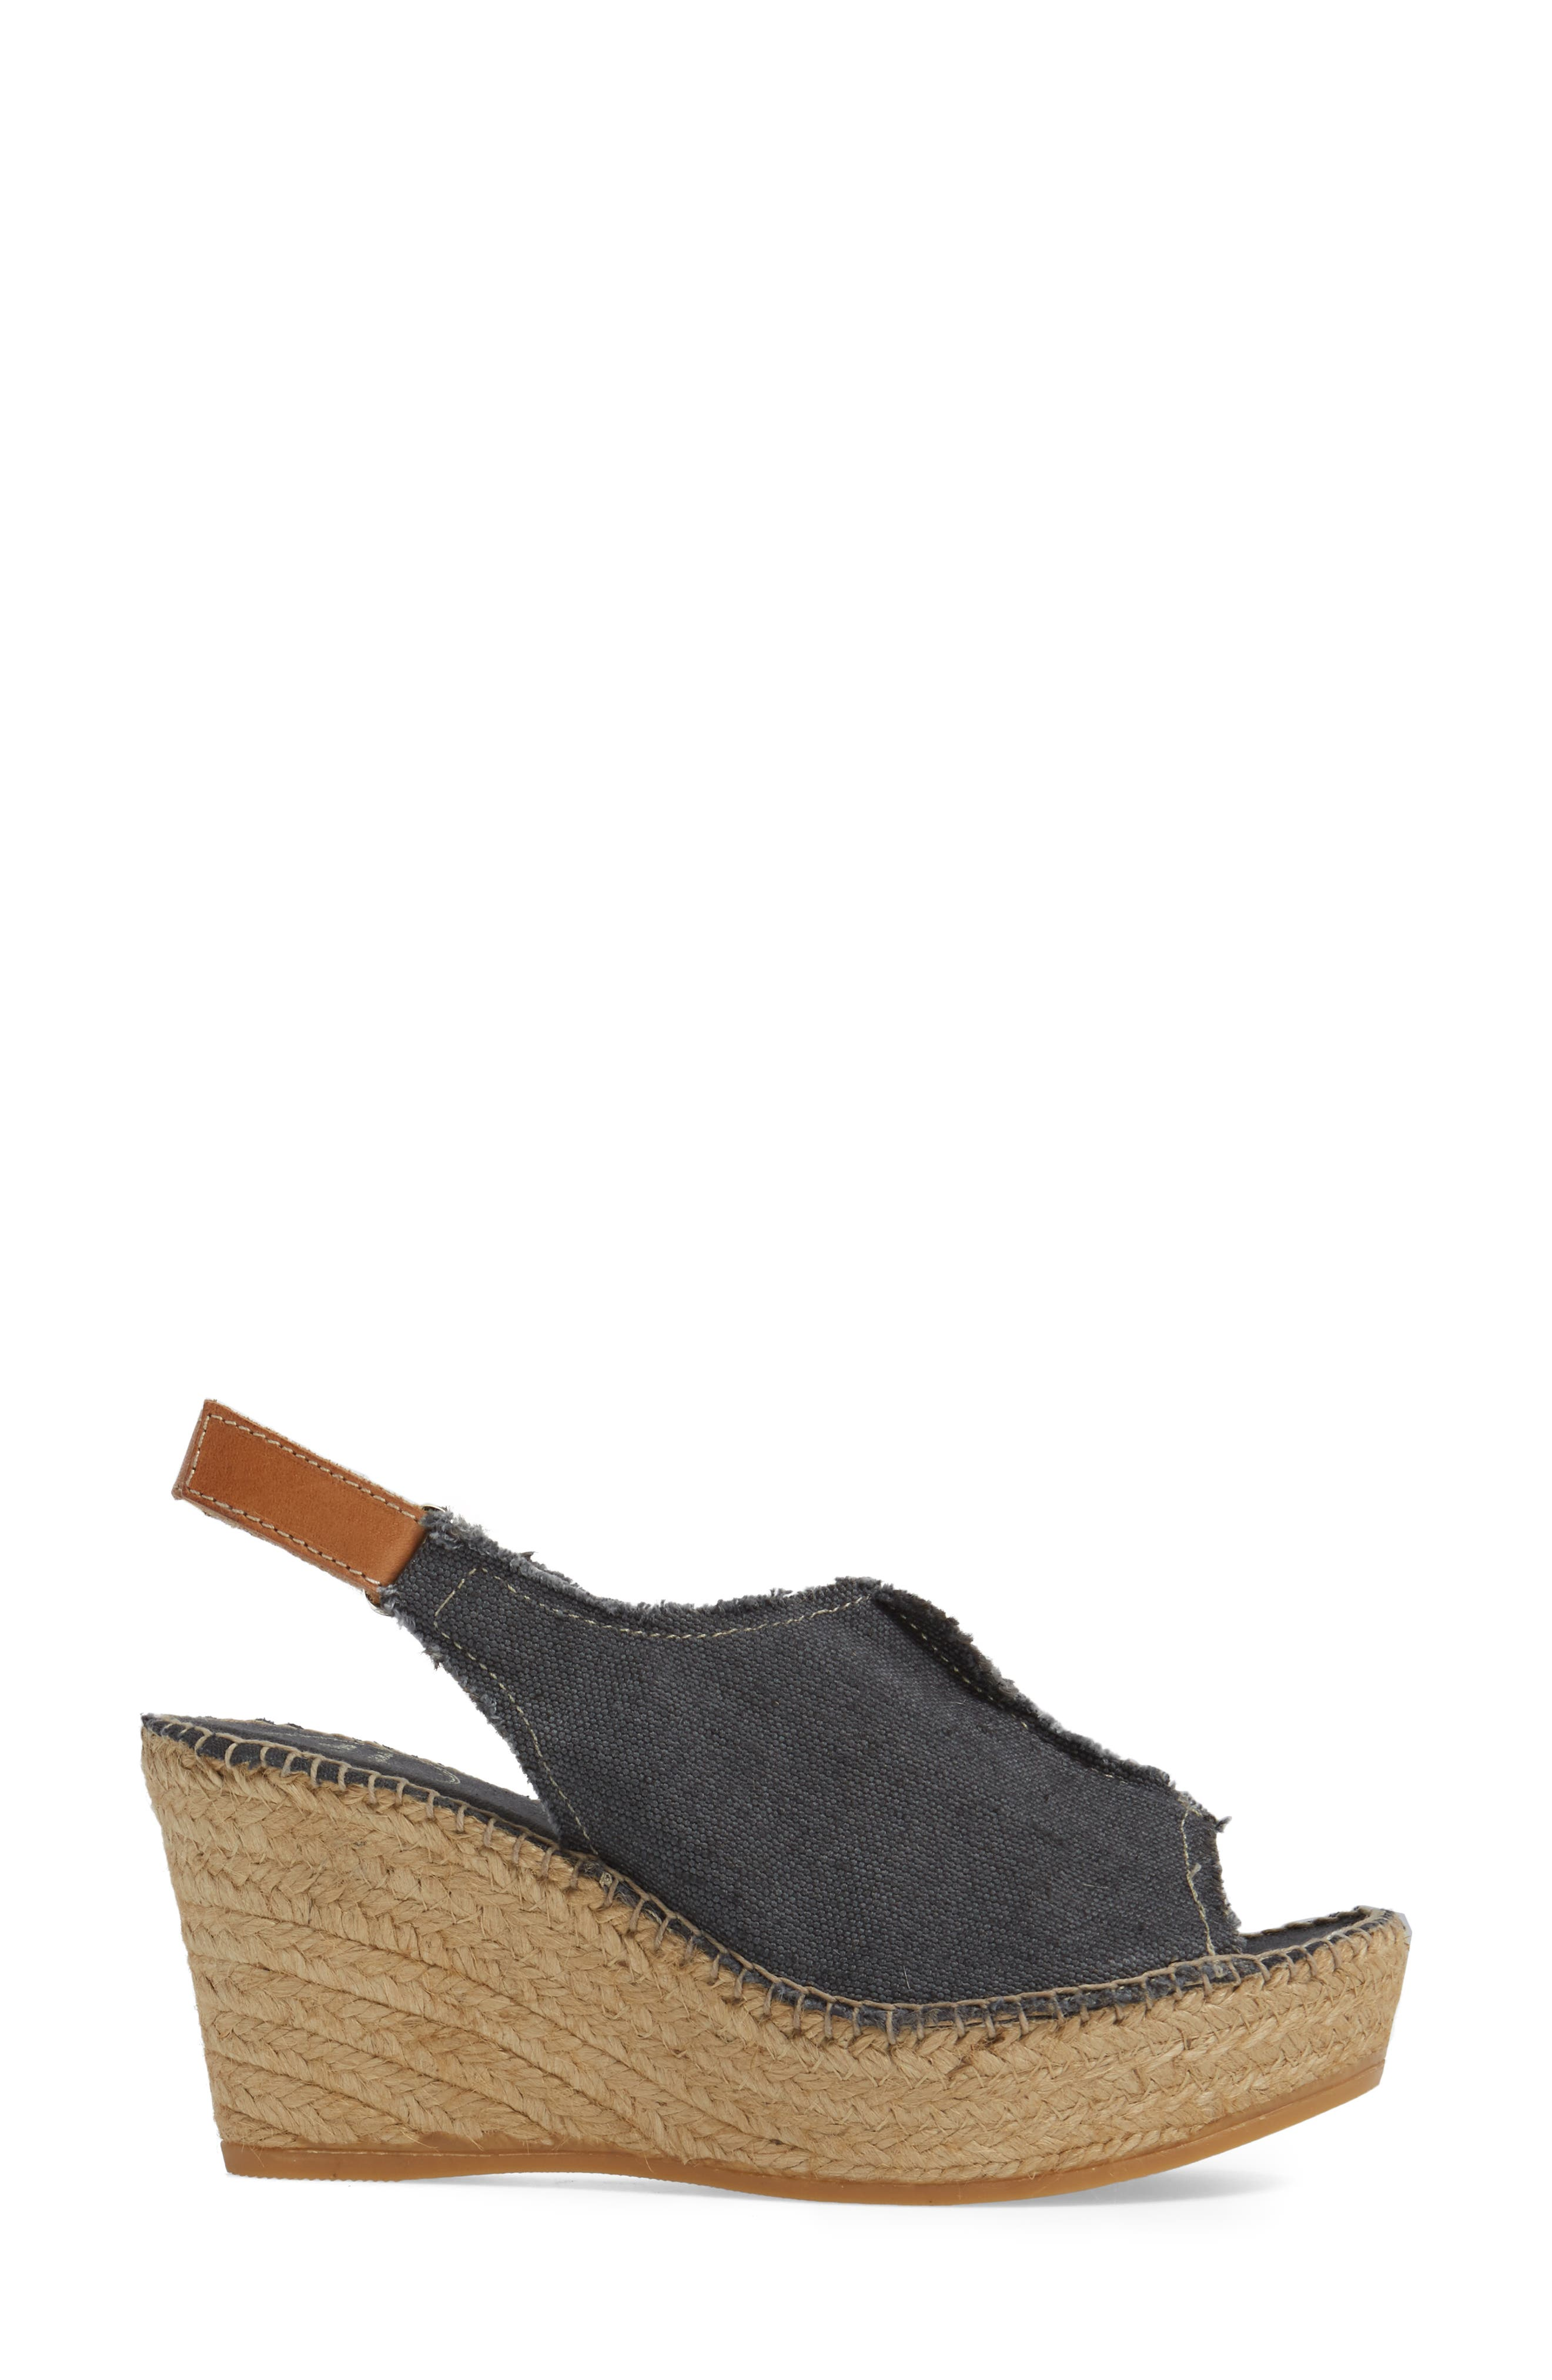 'Lugano' Espadrille Wedge Sandal,                             Alternate thumbnail 3, color,                             BLACK FABRIC